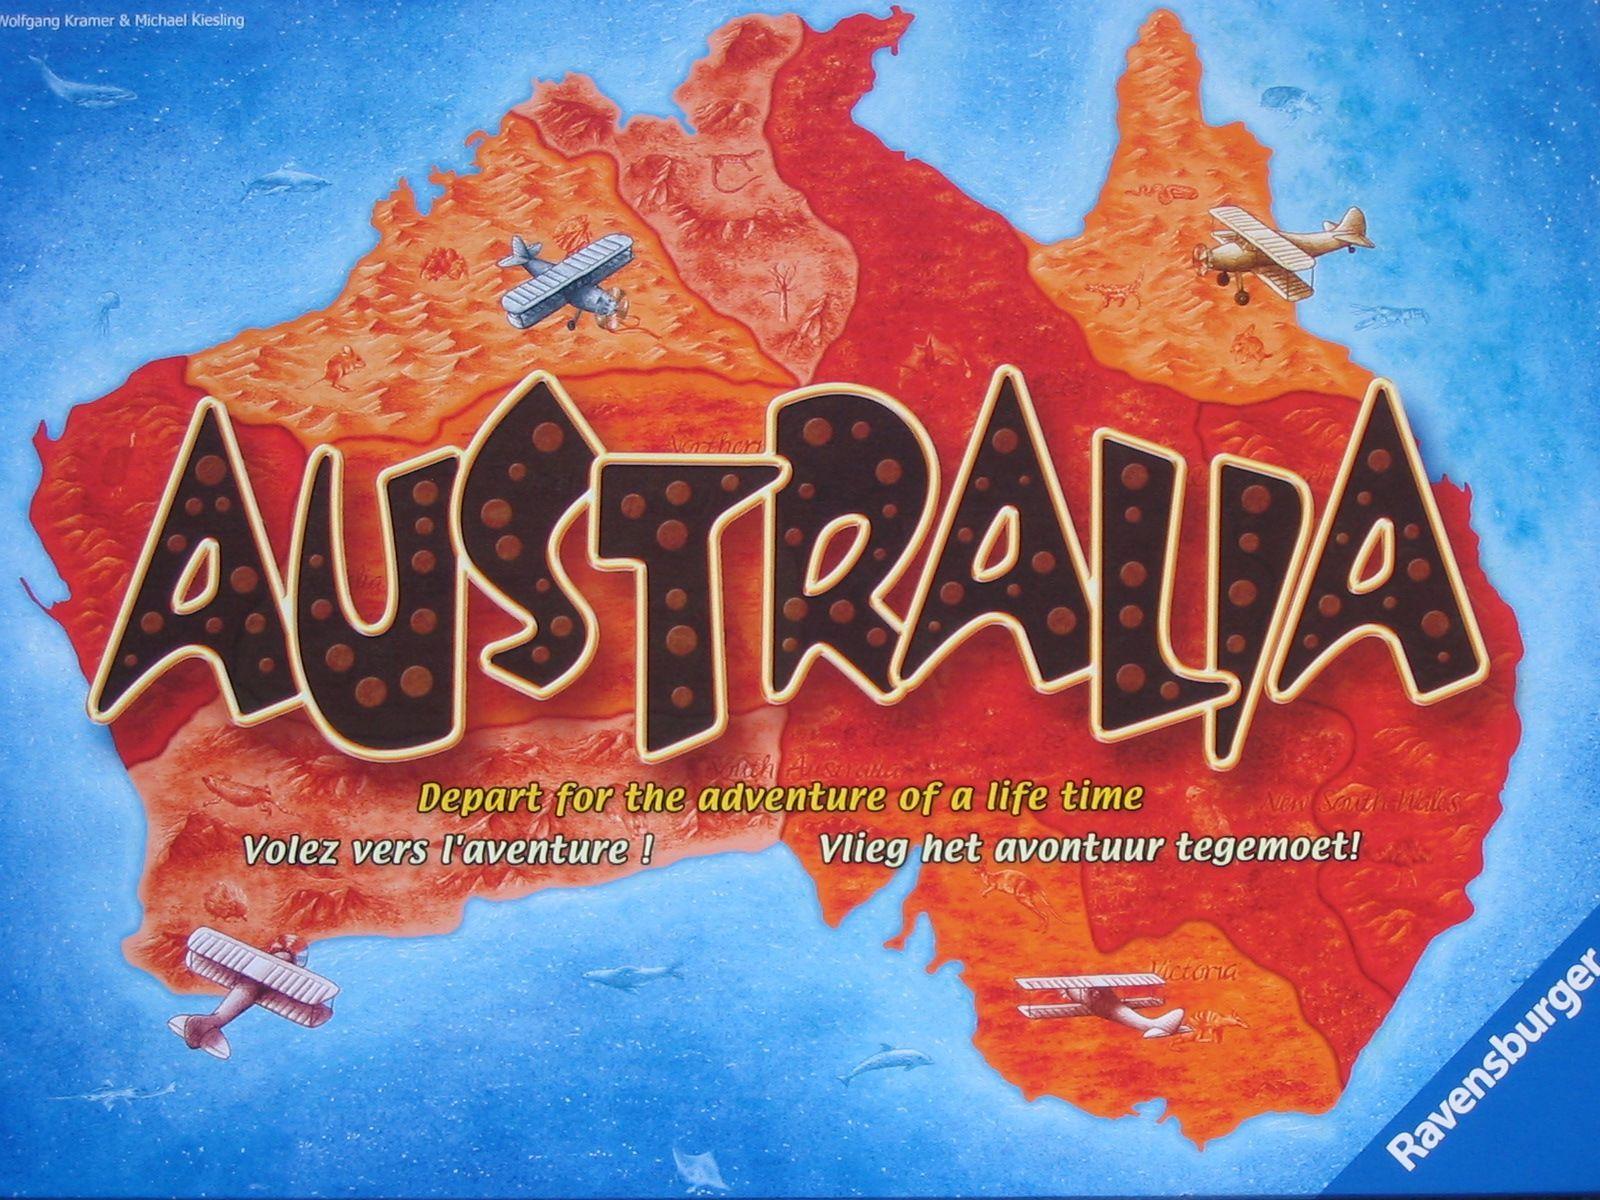 Main image for Australia board game